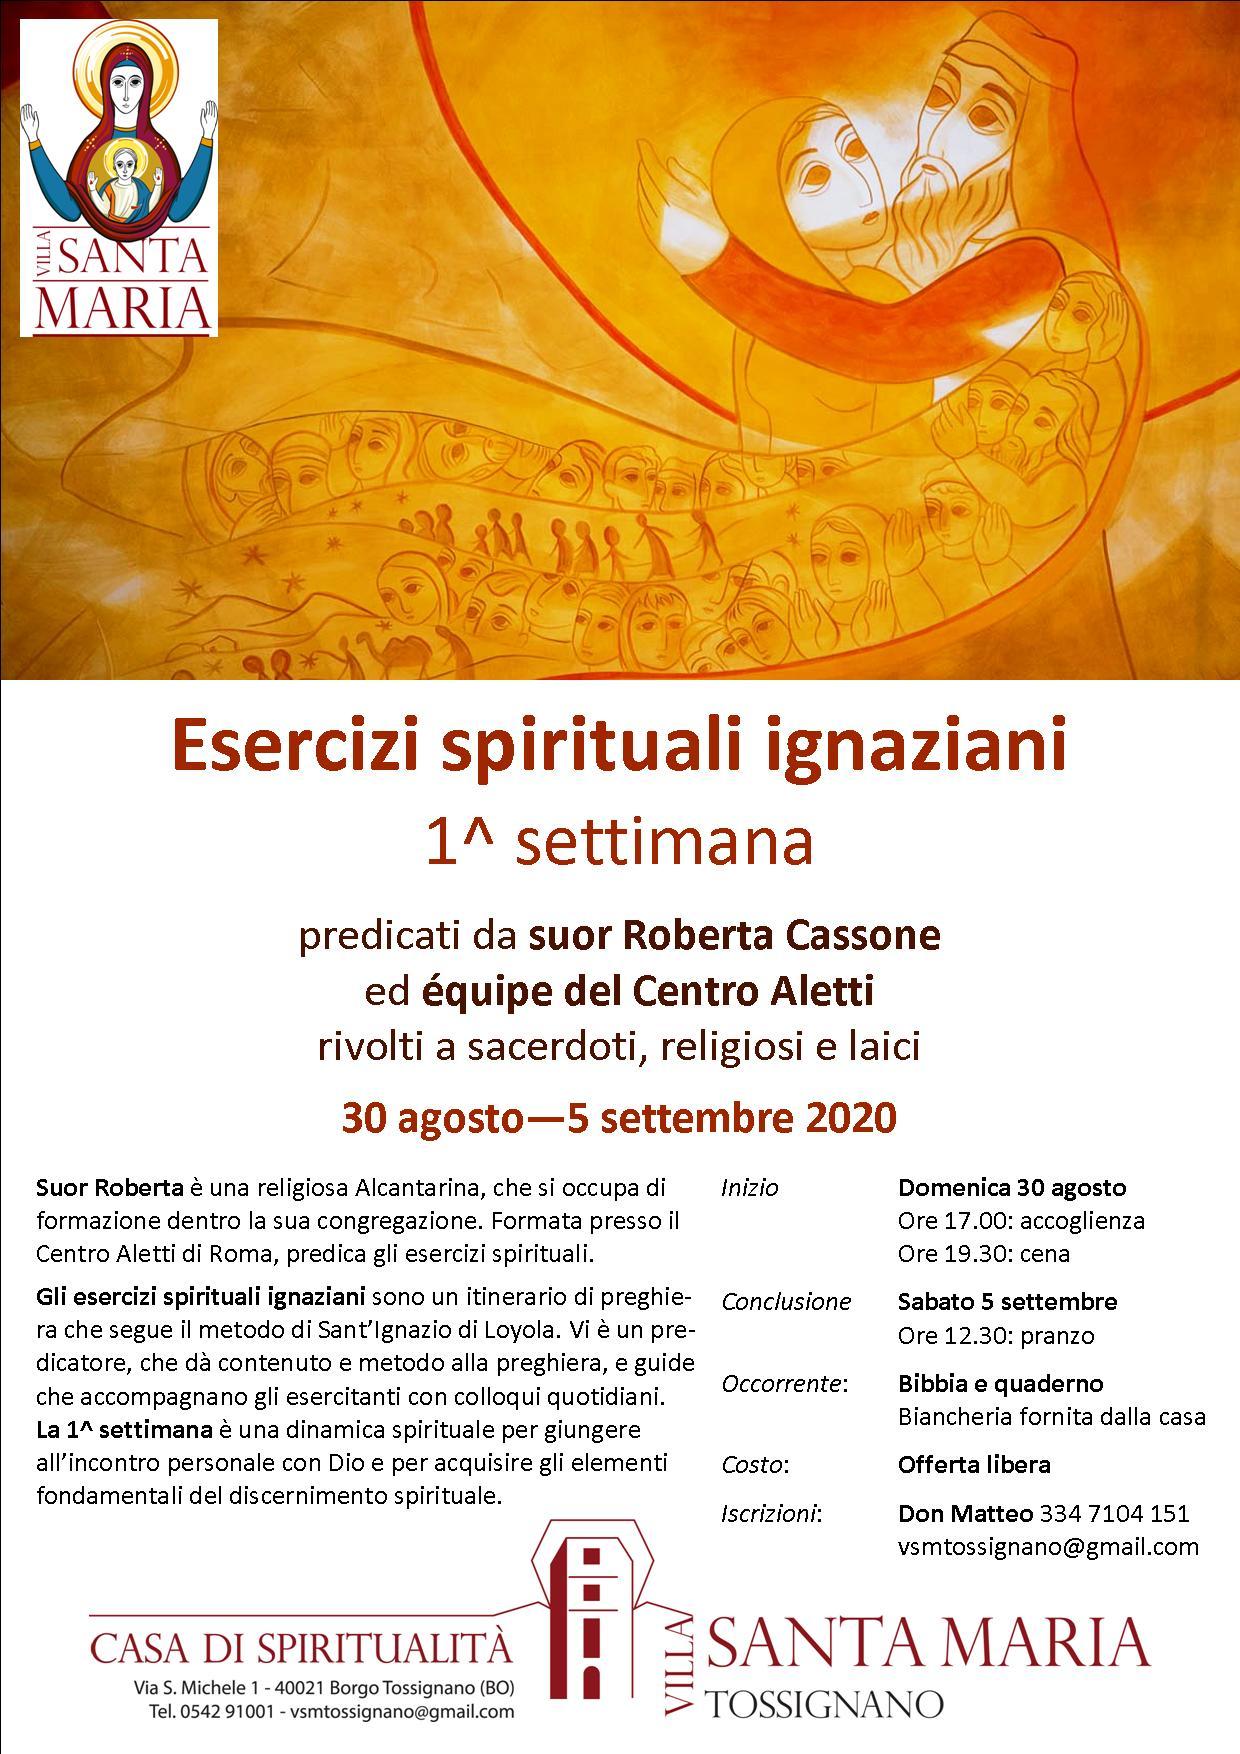 Esercizi spirituali ignaziani